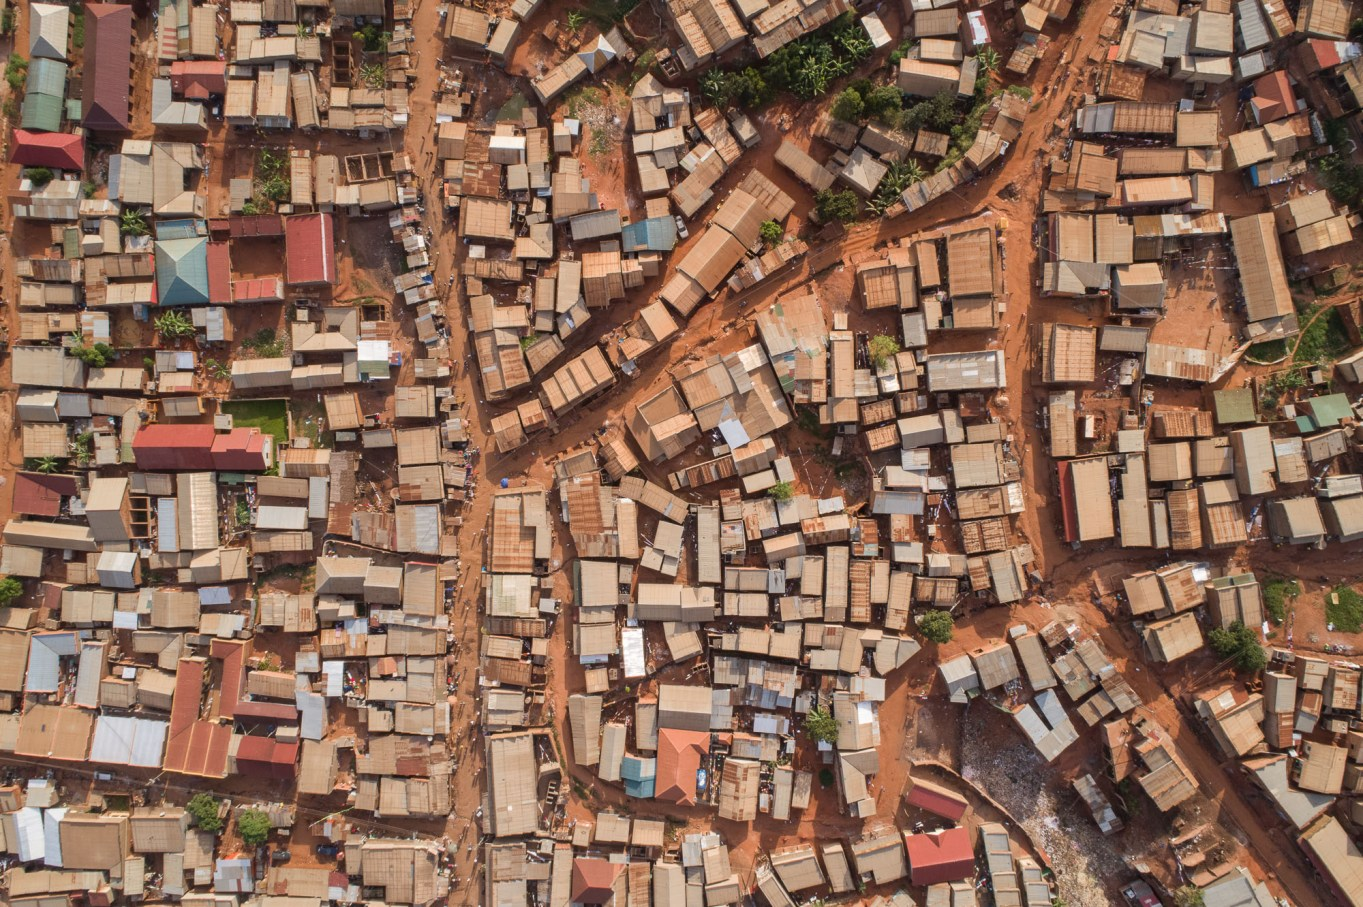 Aerial view of slum communities in Kampala, Uganda.